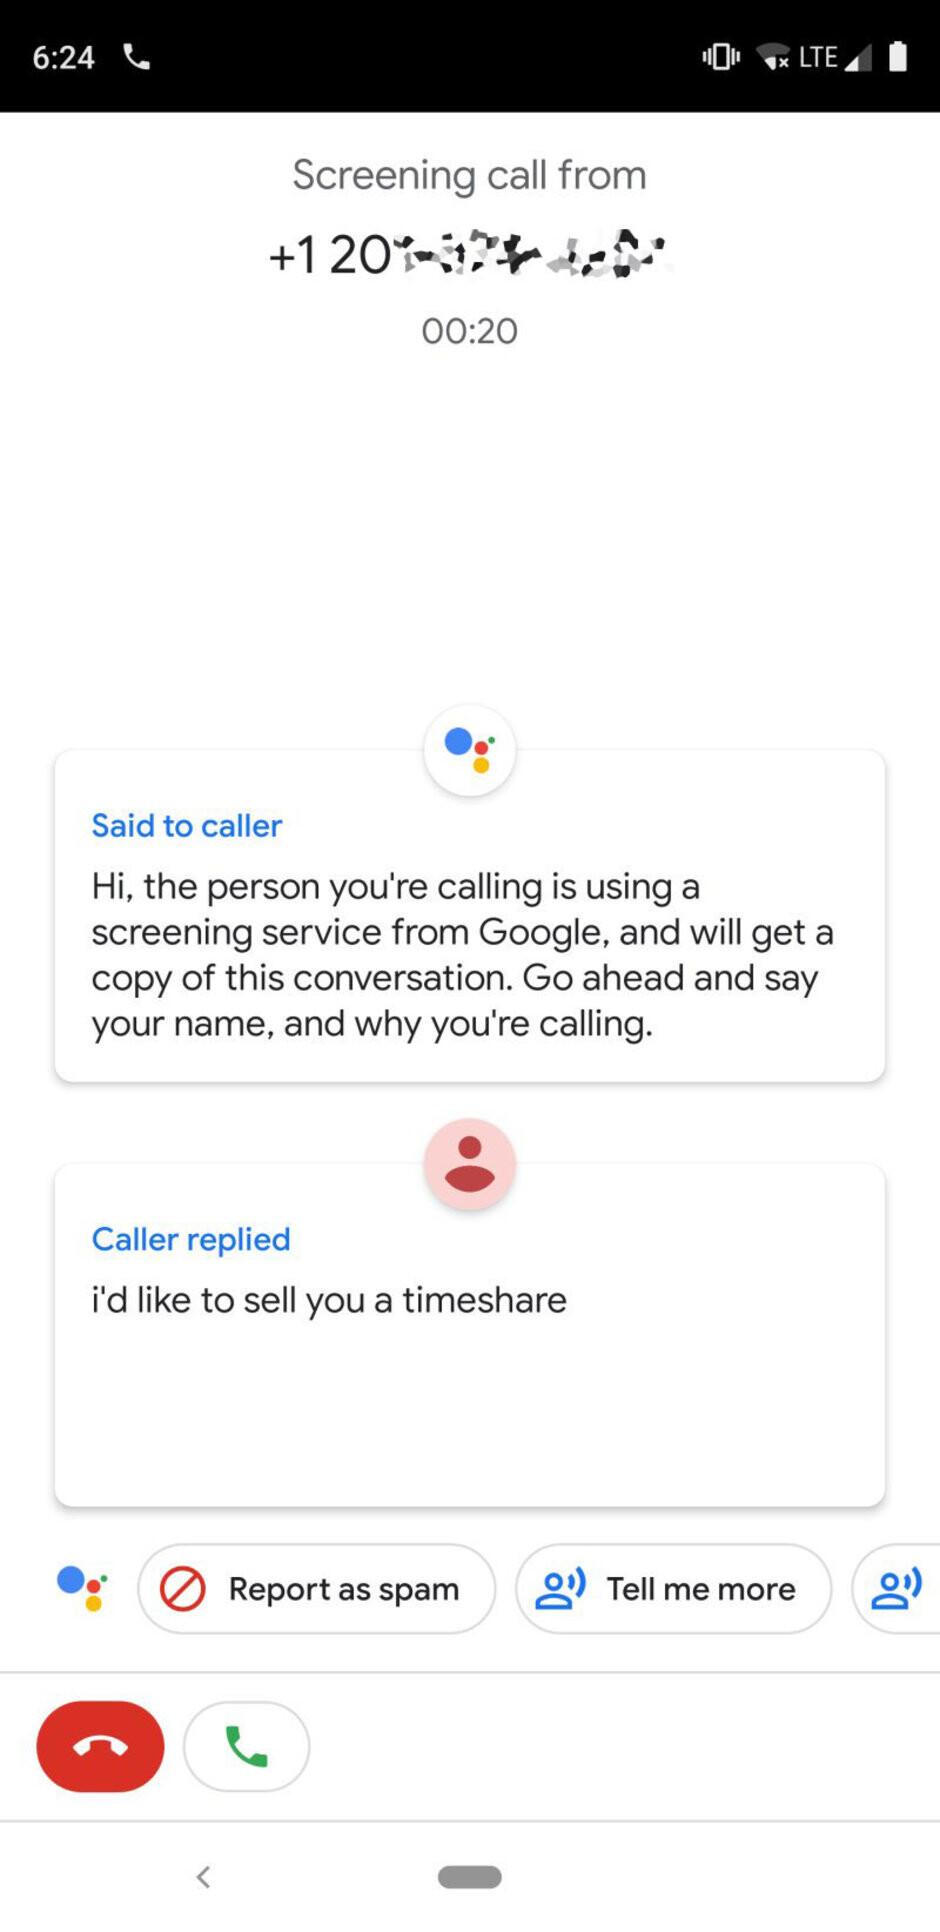 Google Pixel 3 (Call Screening shown in image #4) - Google Pixel 3 vs Apple iPhone XS